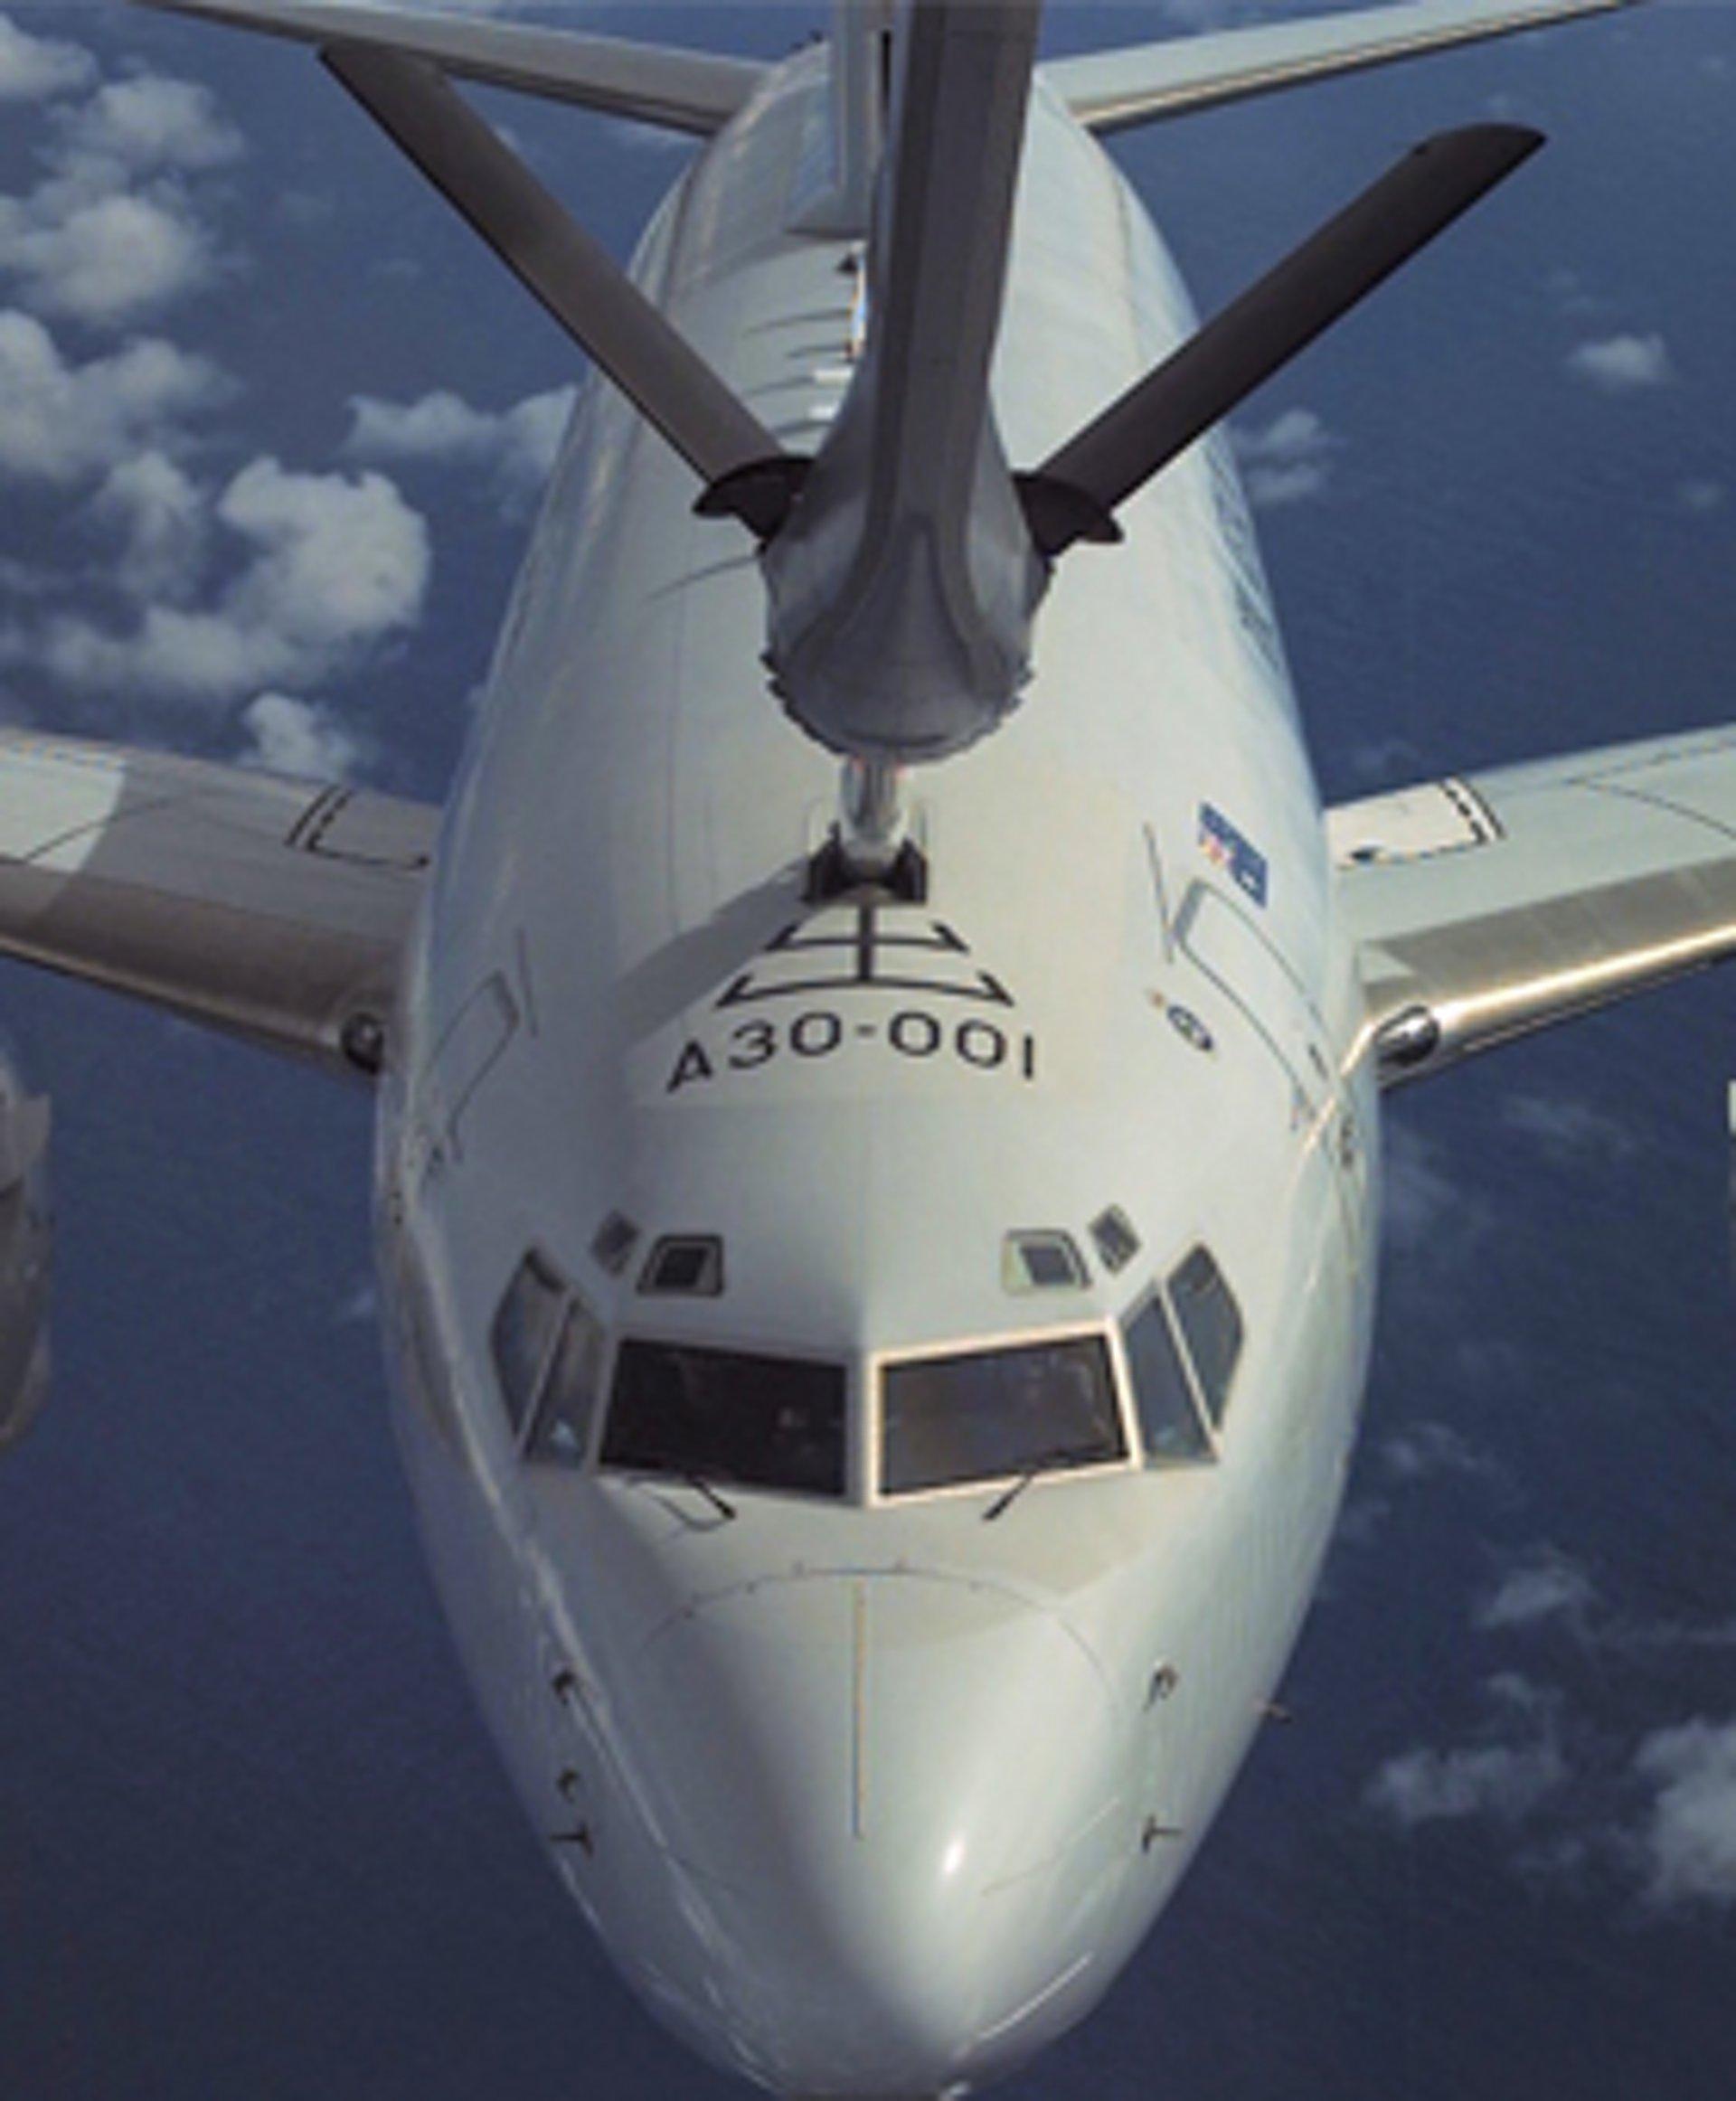 A330 MRTT refuelling